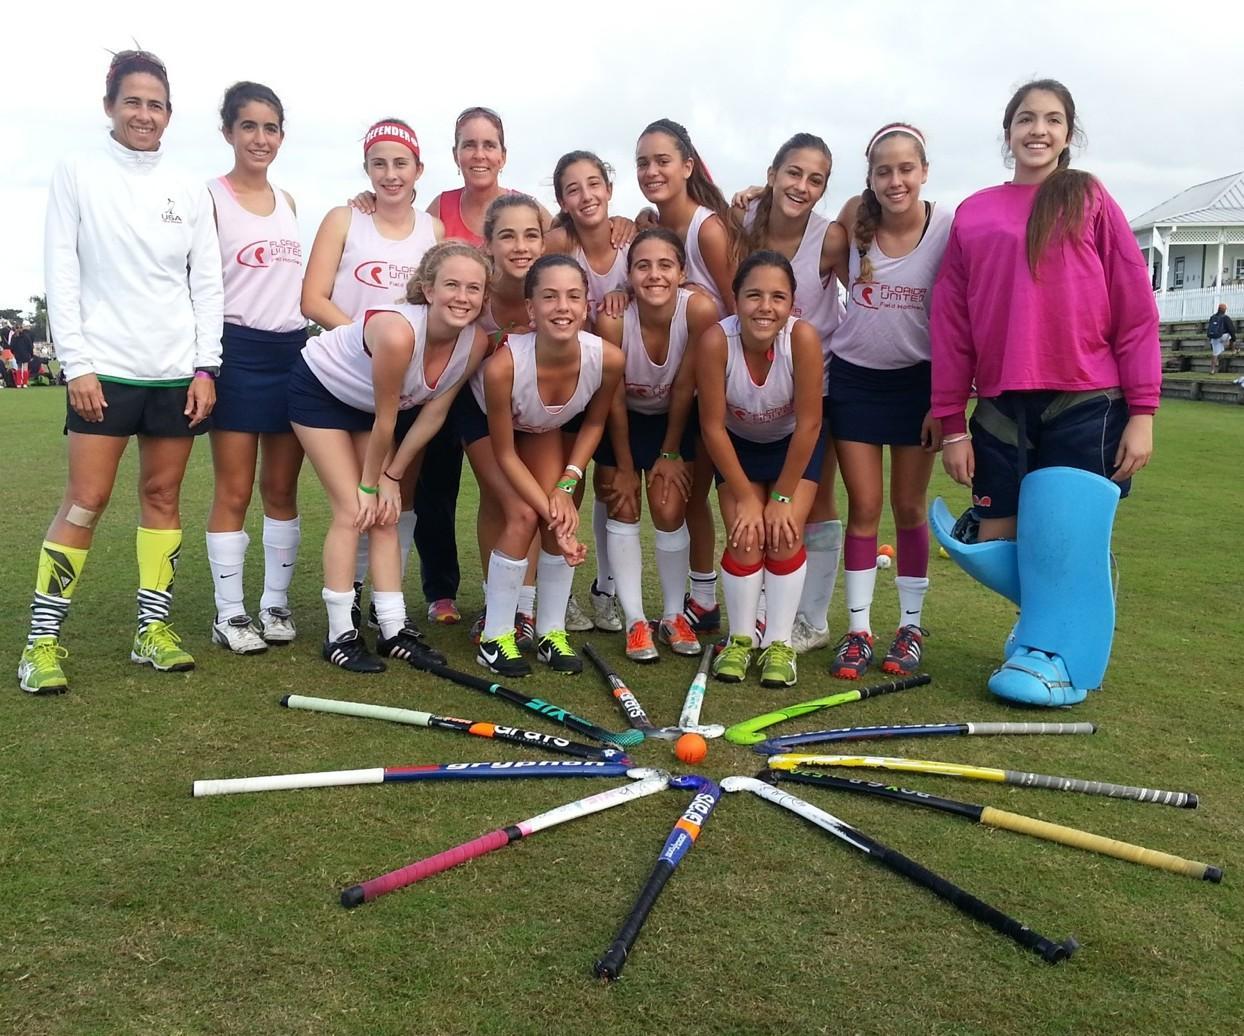 Julene Valmaña (left, front row) poses with her field hockey team, Florida United.